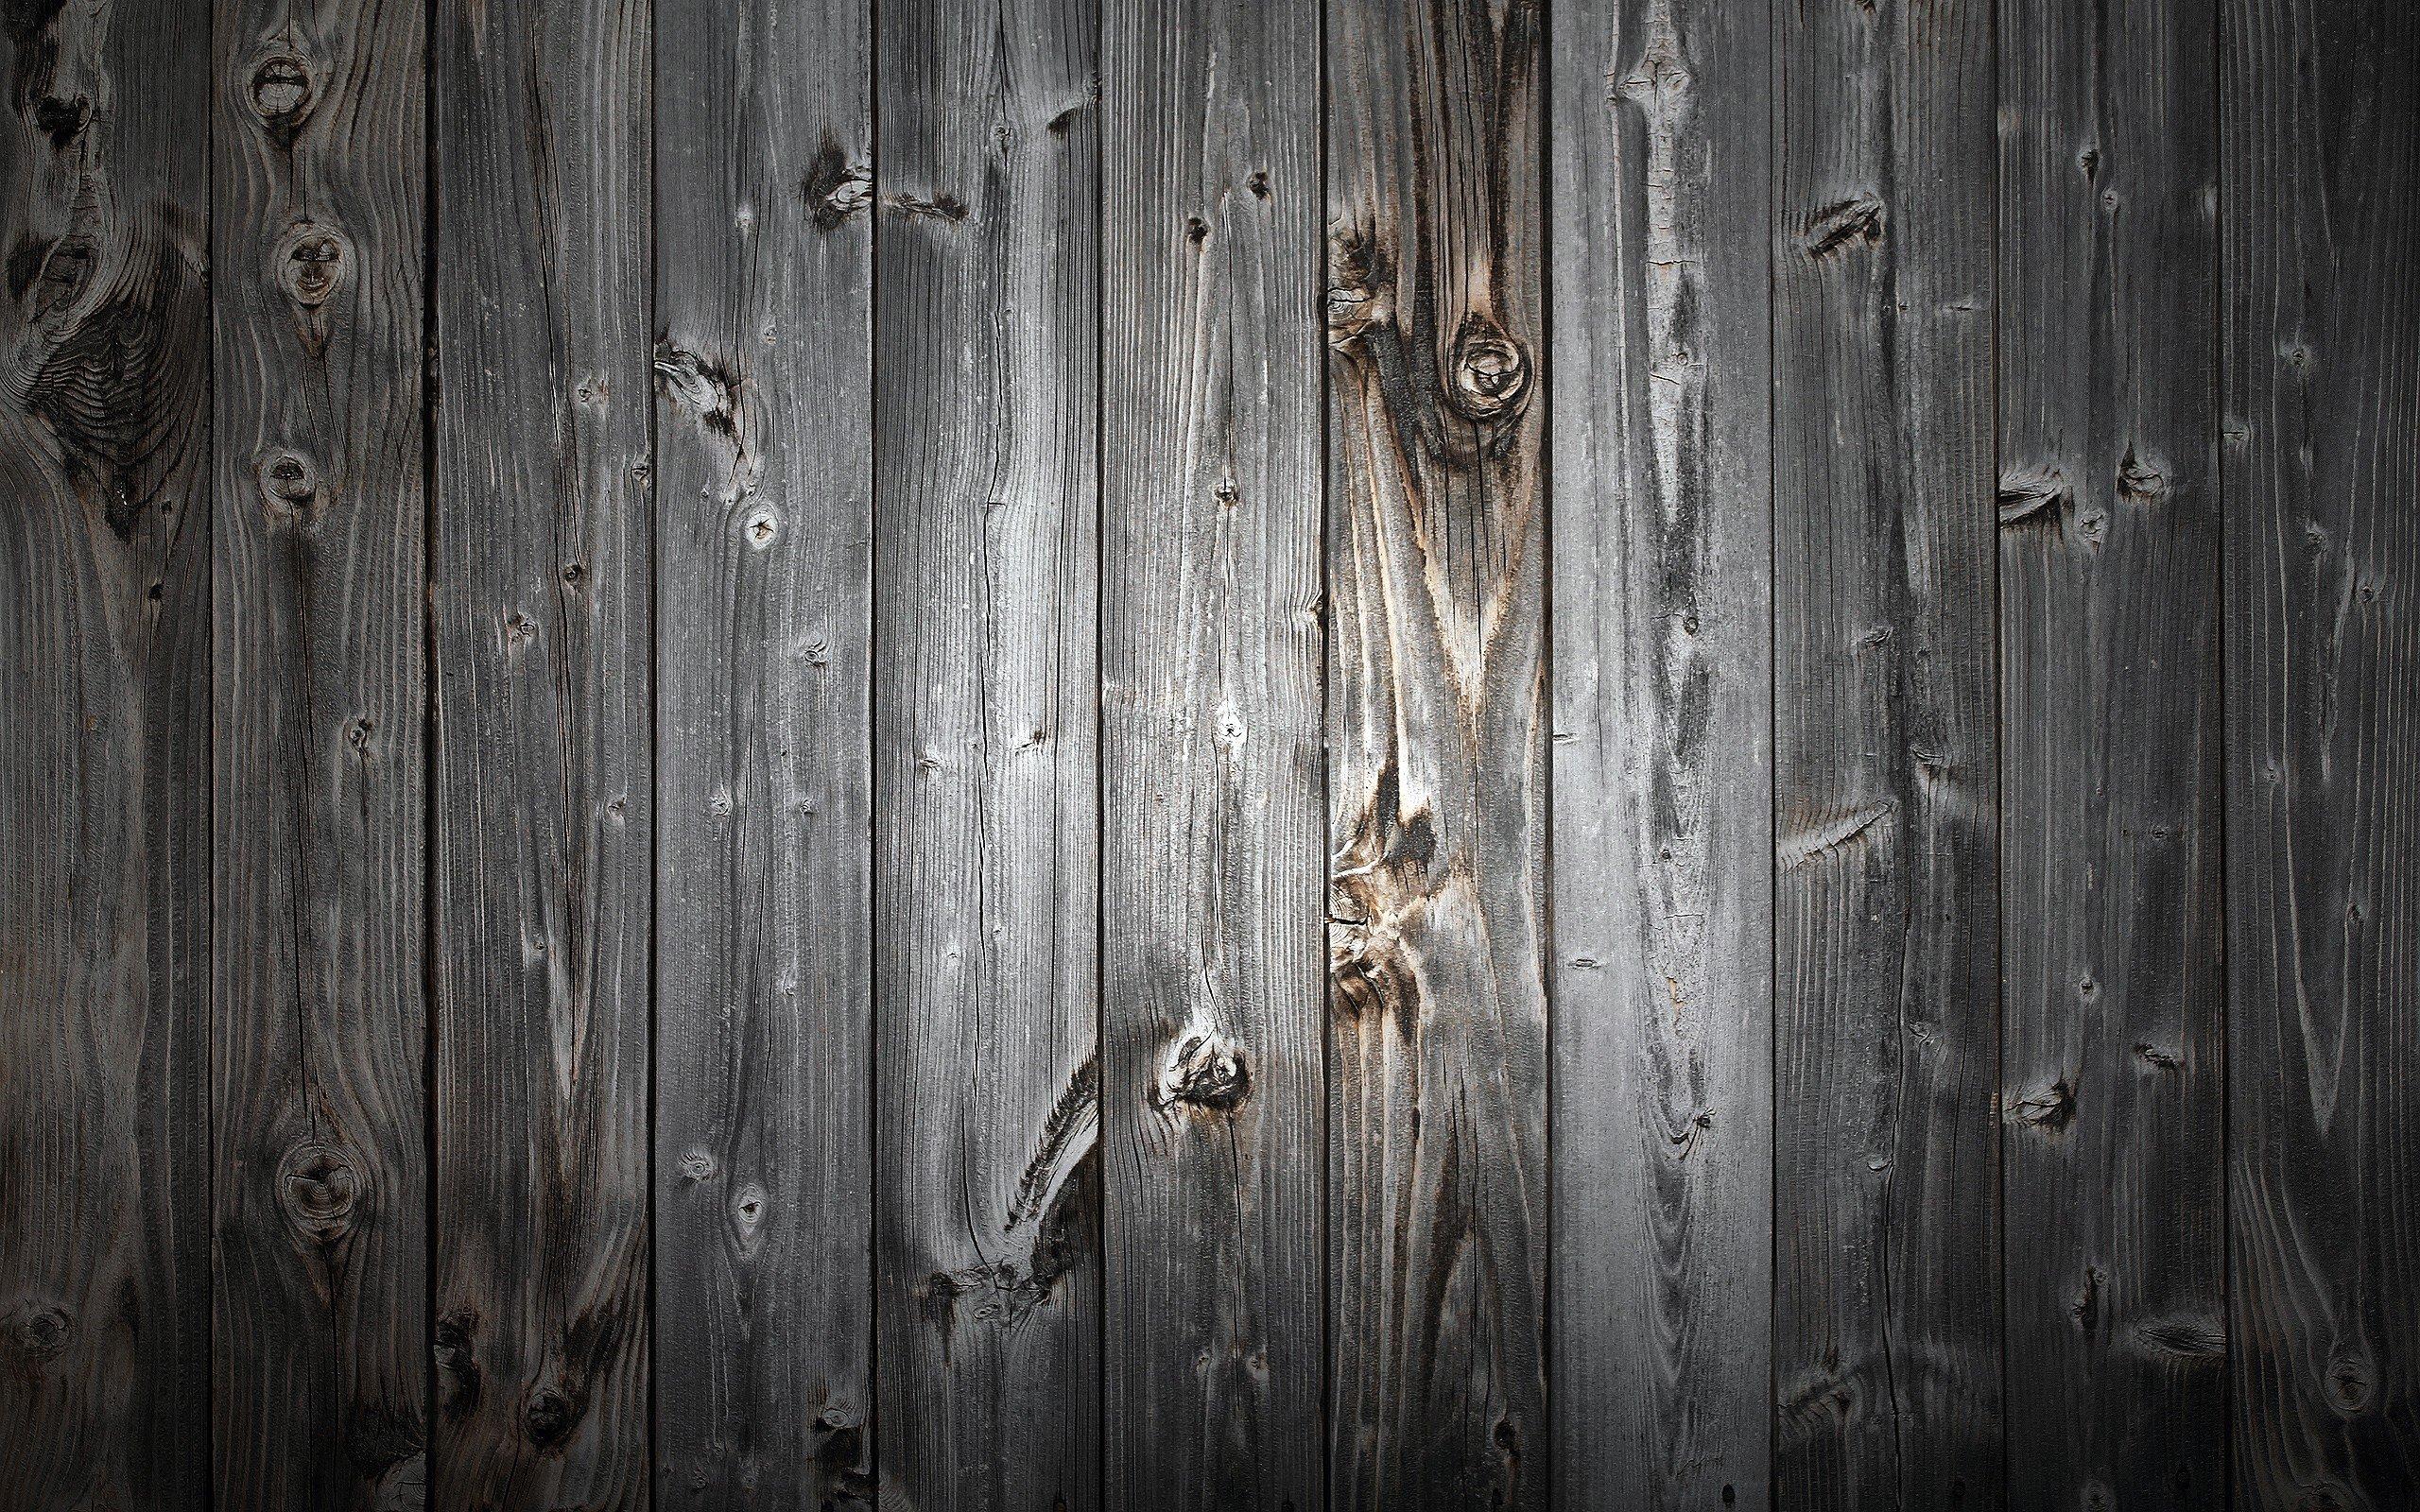 wood_textures_barn_2560x1600.jpg